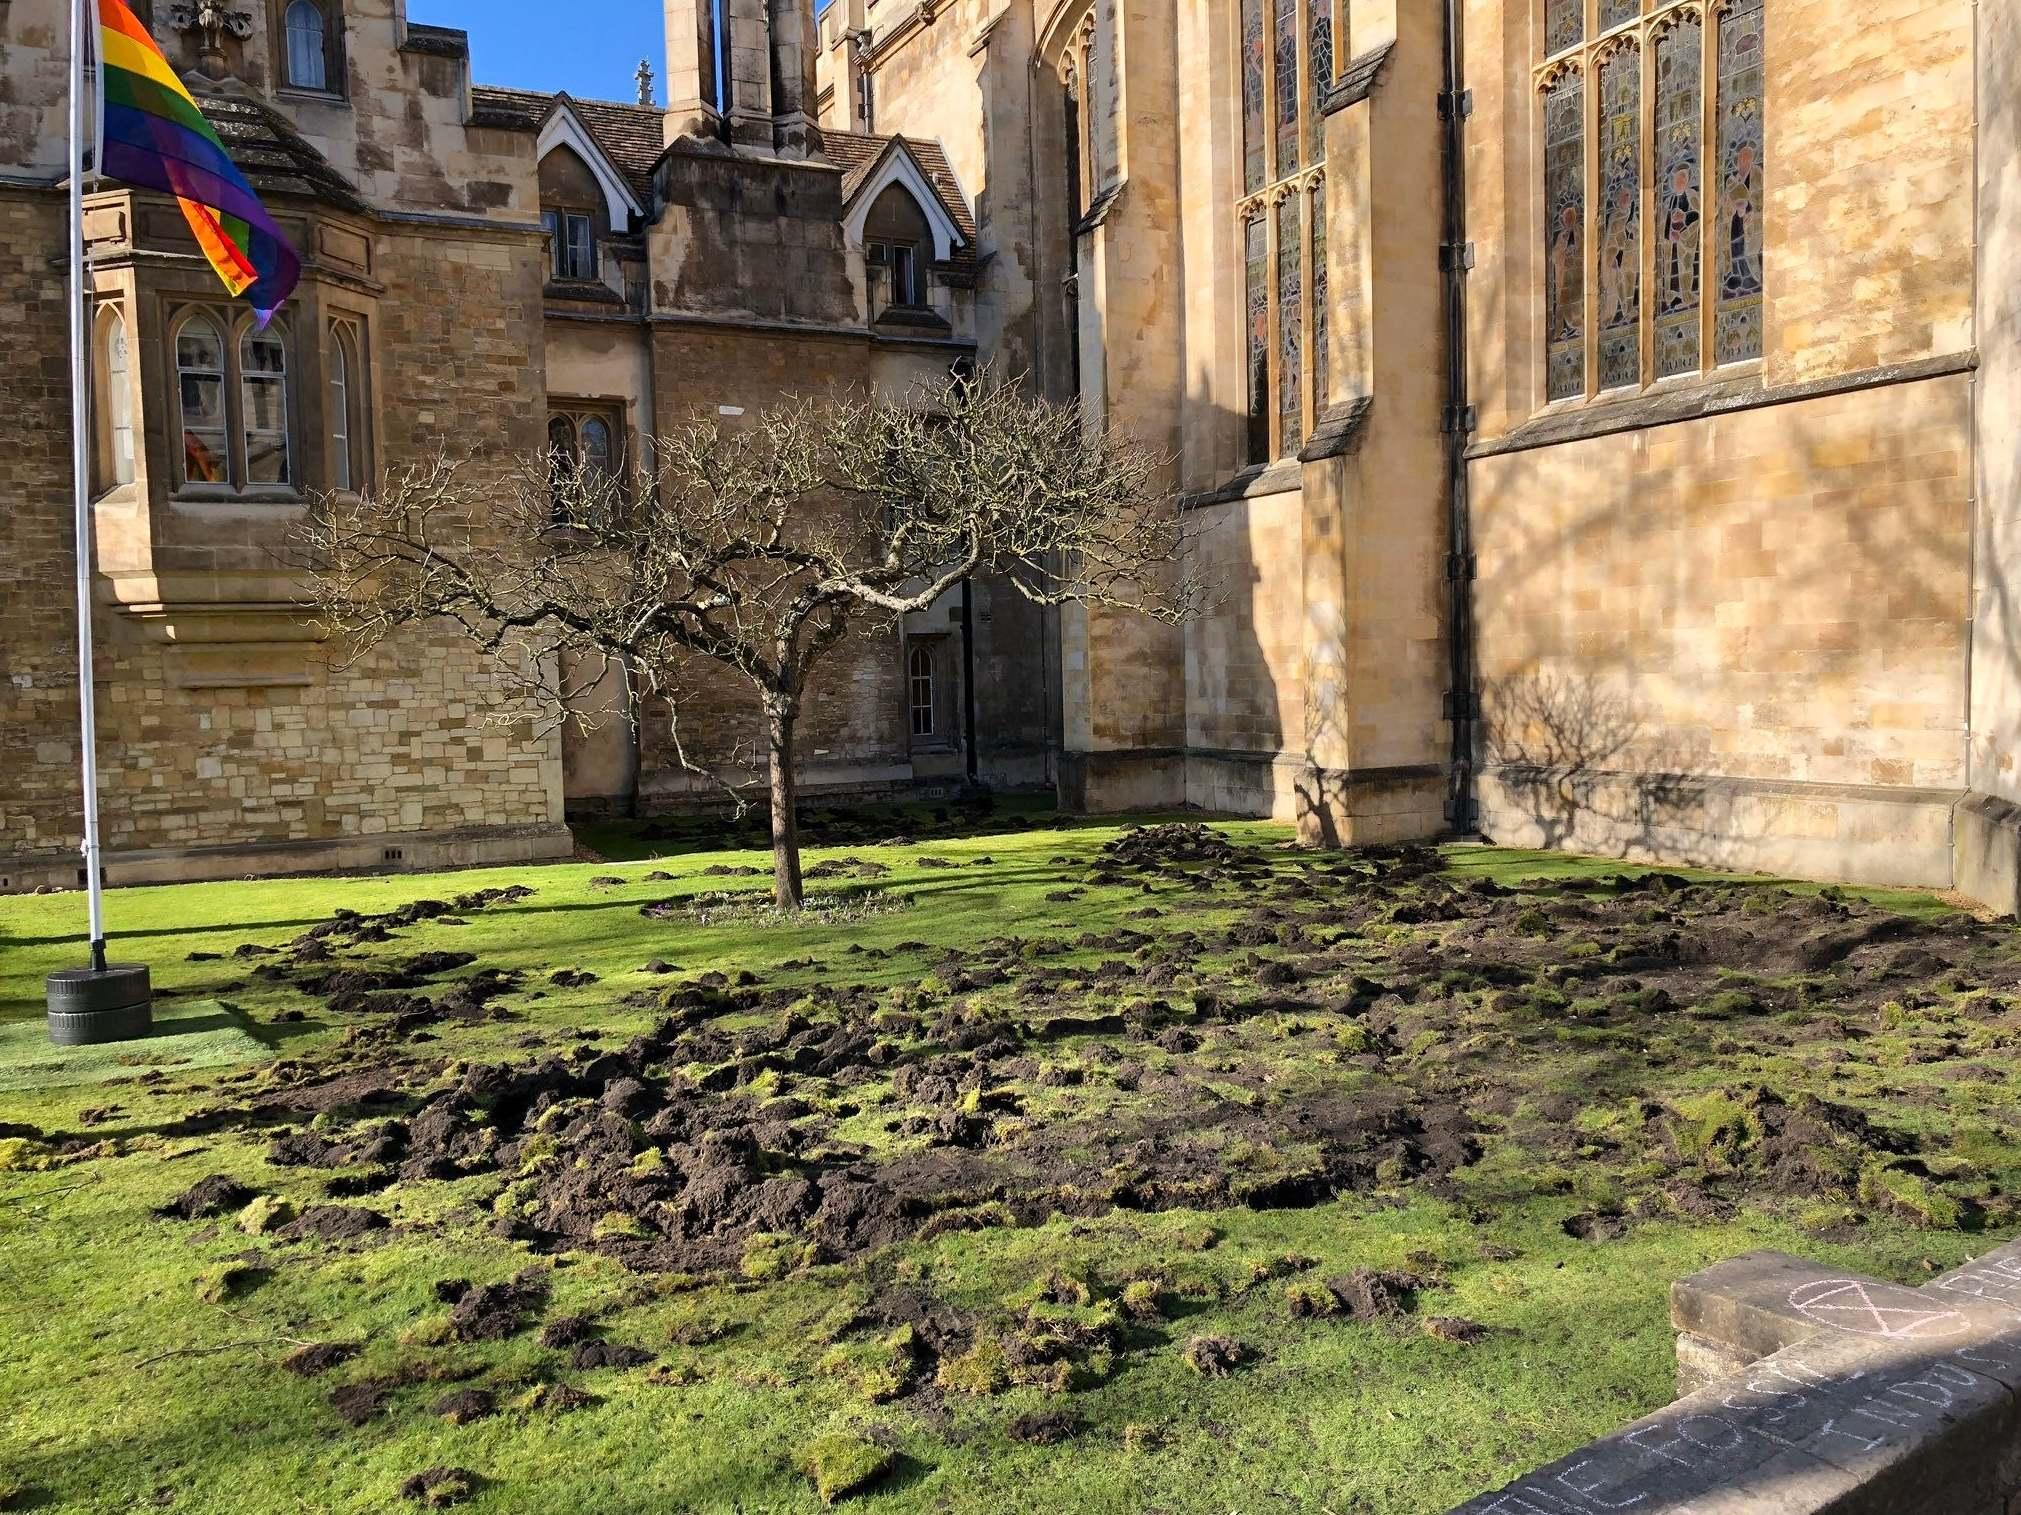 Extinction Rebellion dig up Cambridge University lawn